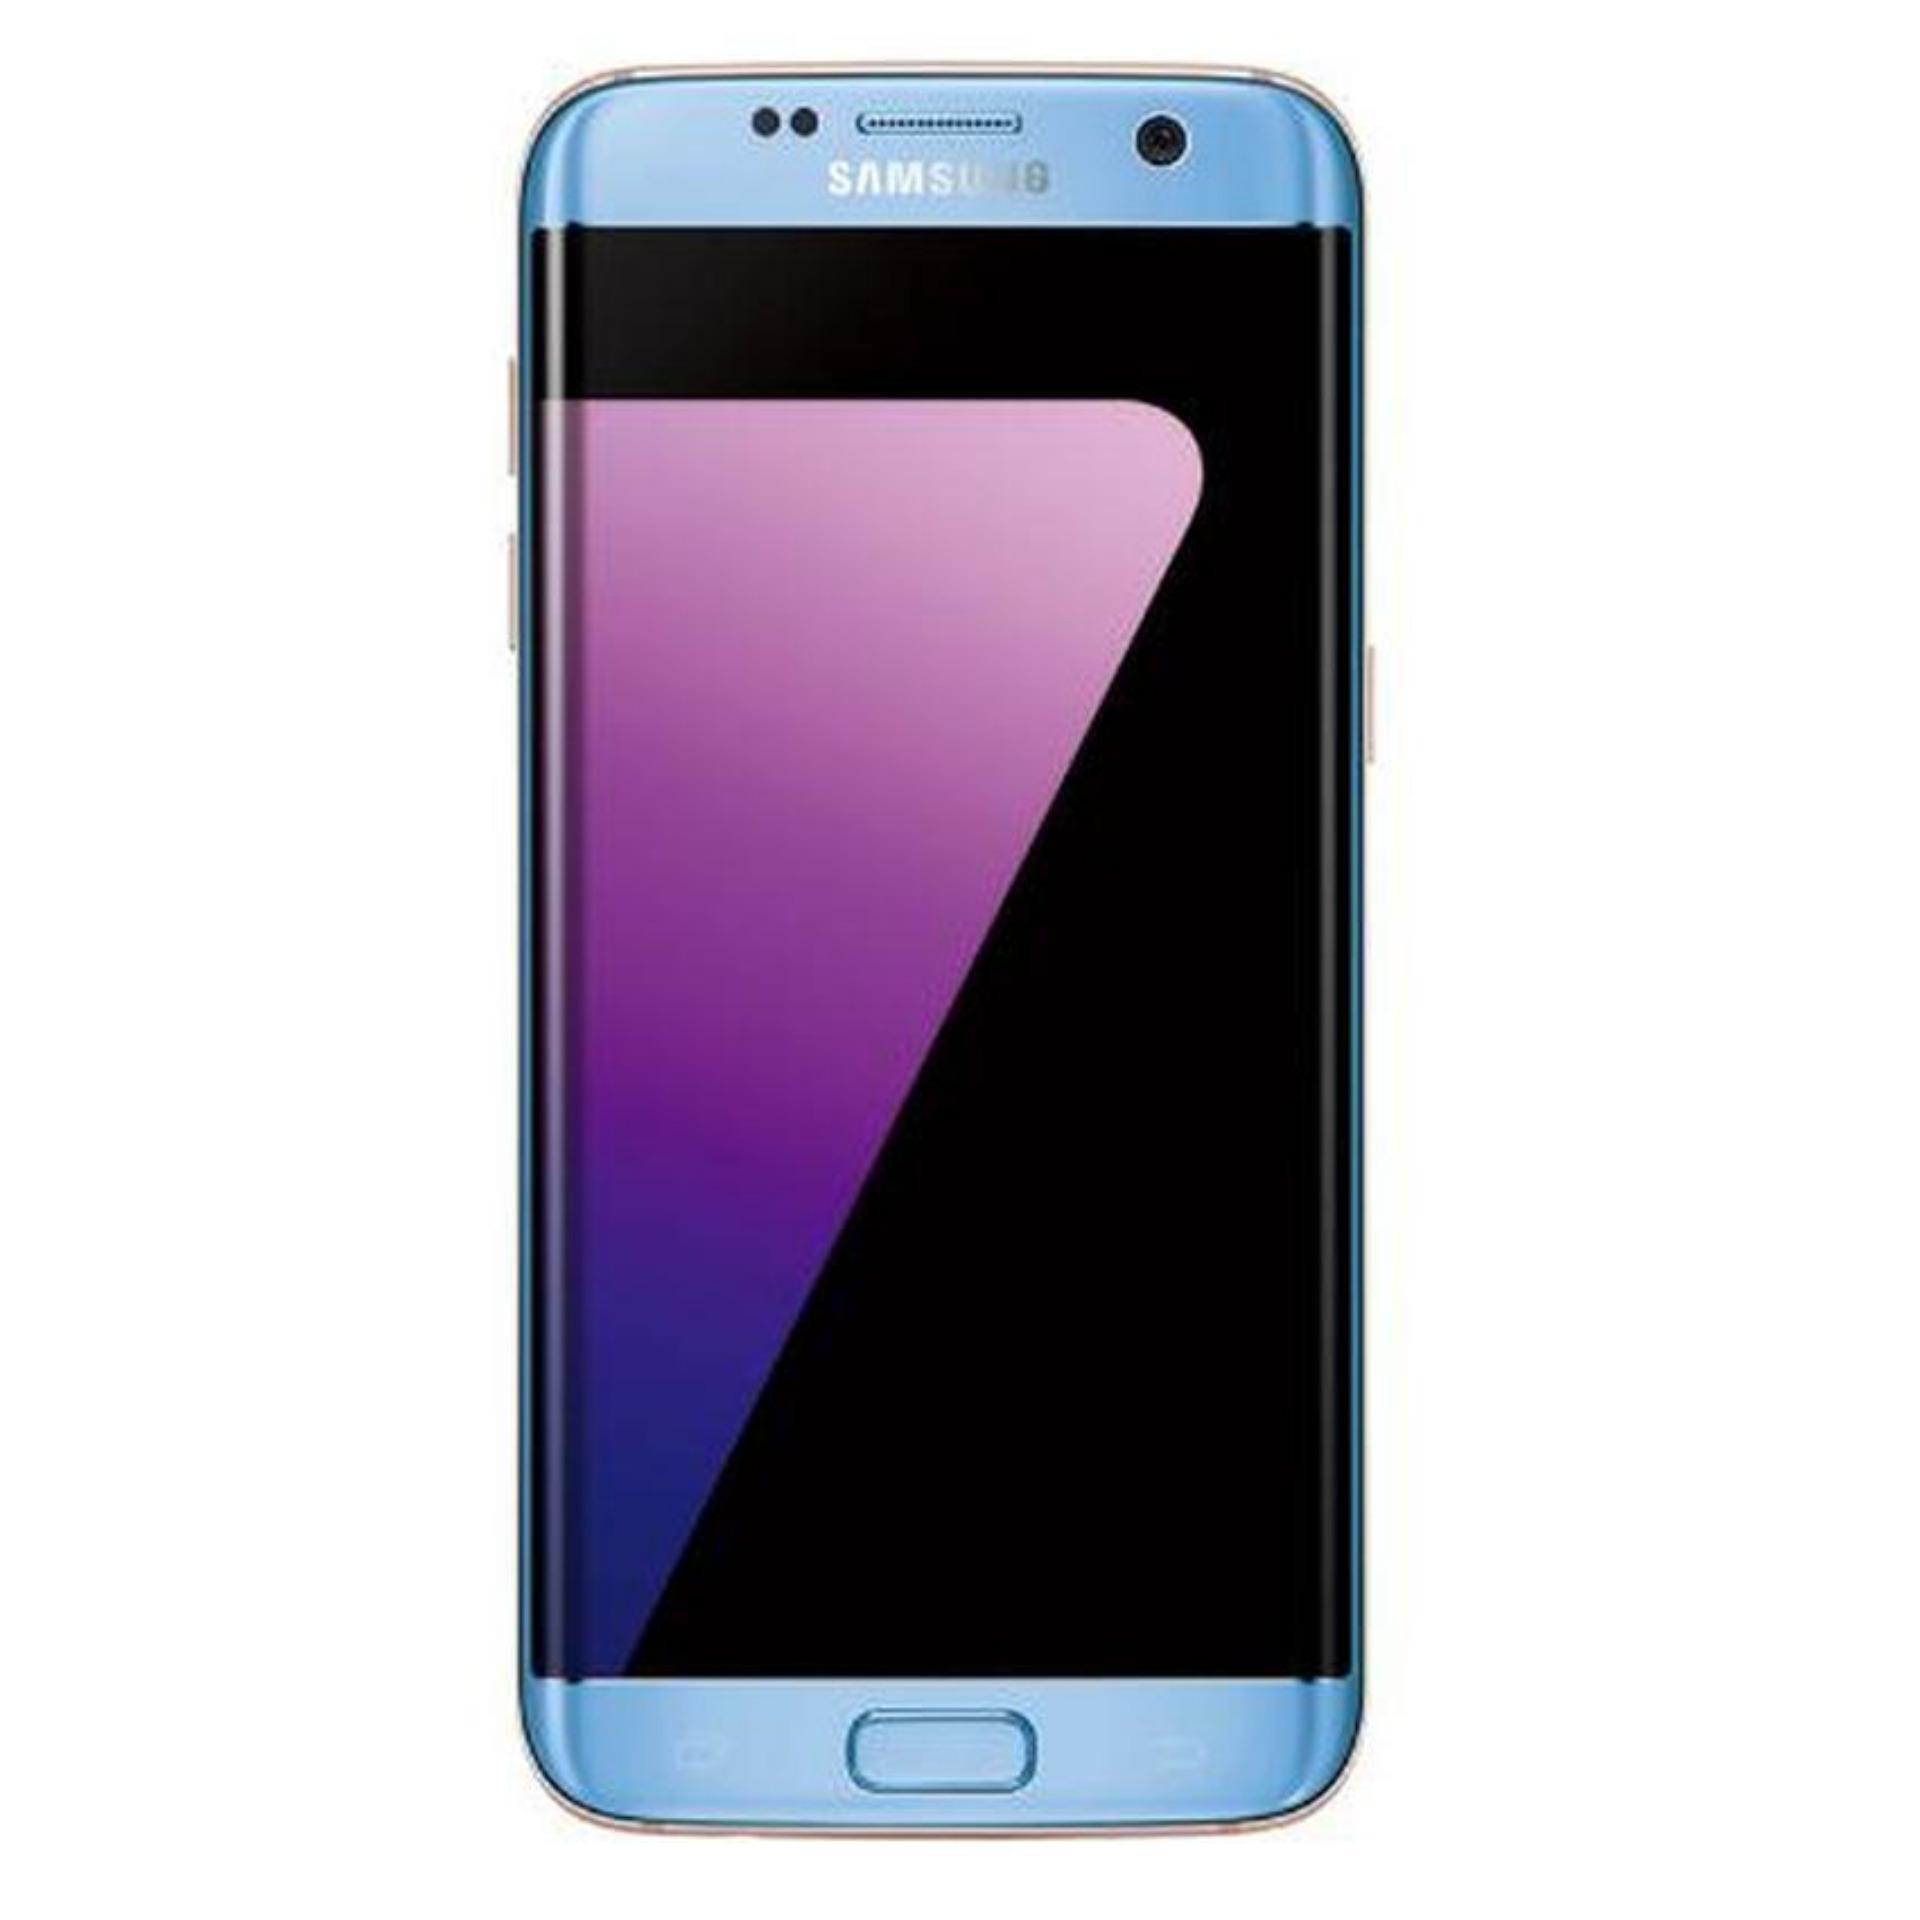 Samsung Galaxy S7 Edge - 32GB - Blue Coral